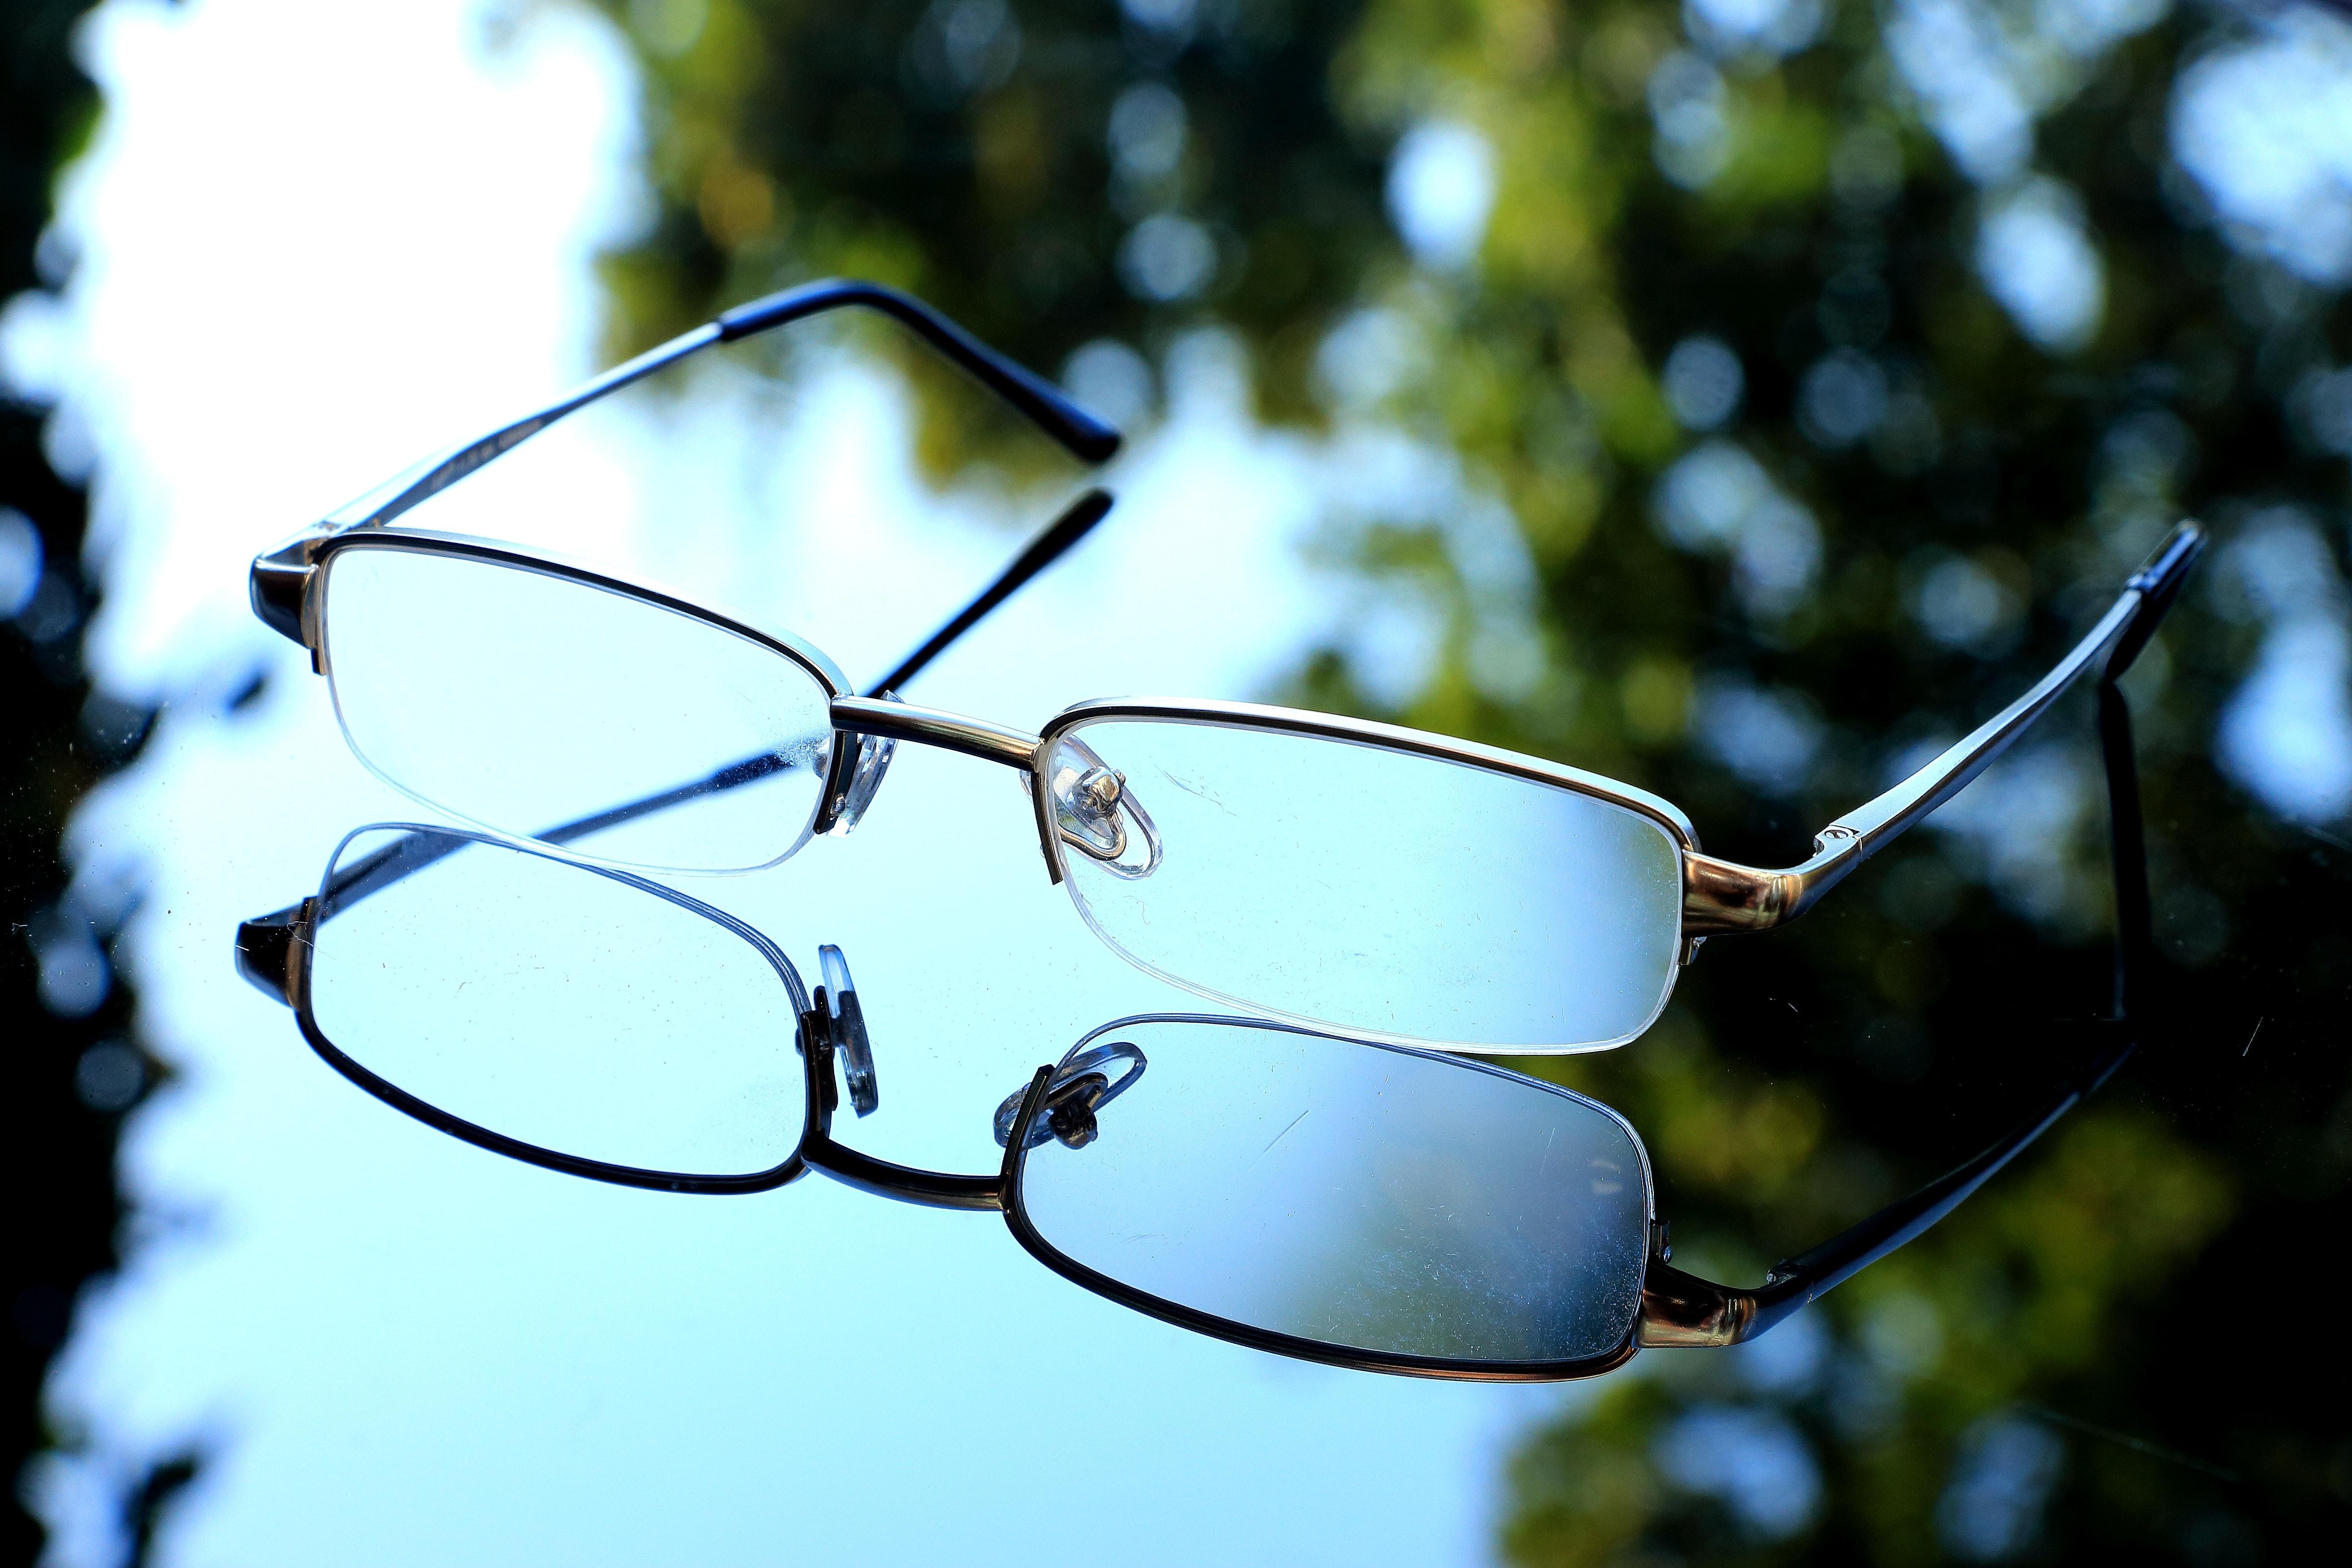 03a26dbc6ae9 Gratis lagerfoto af briller